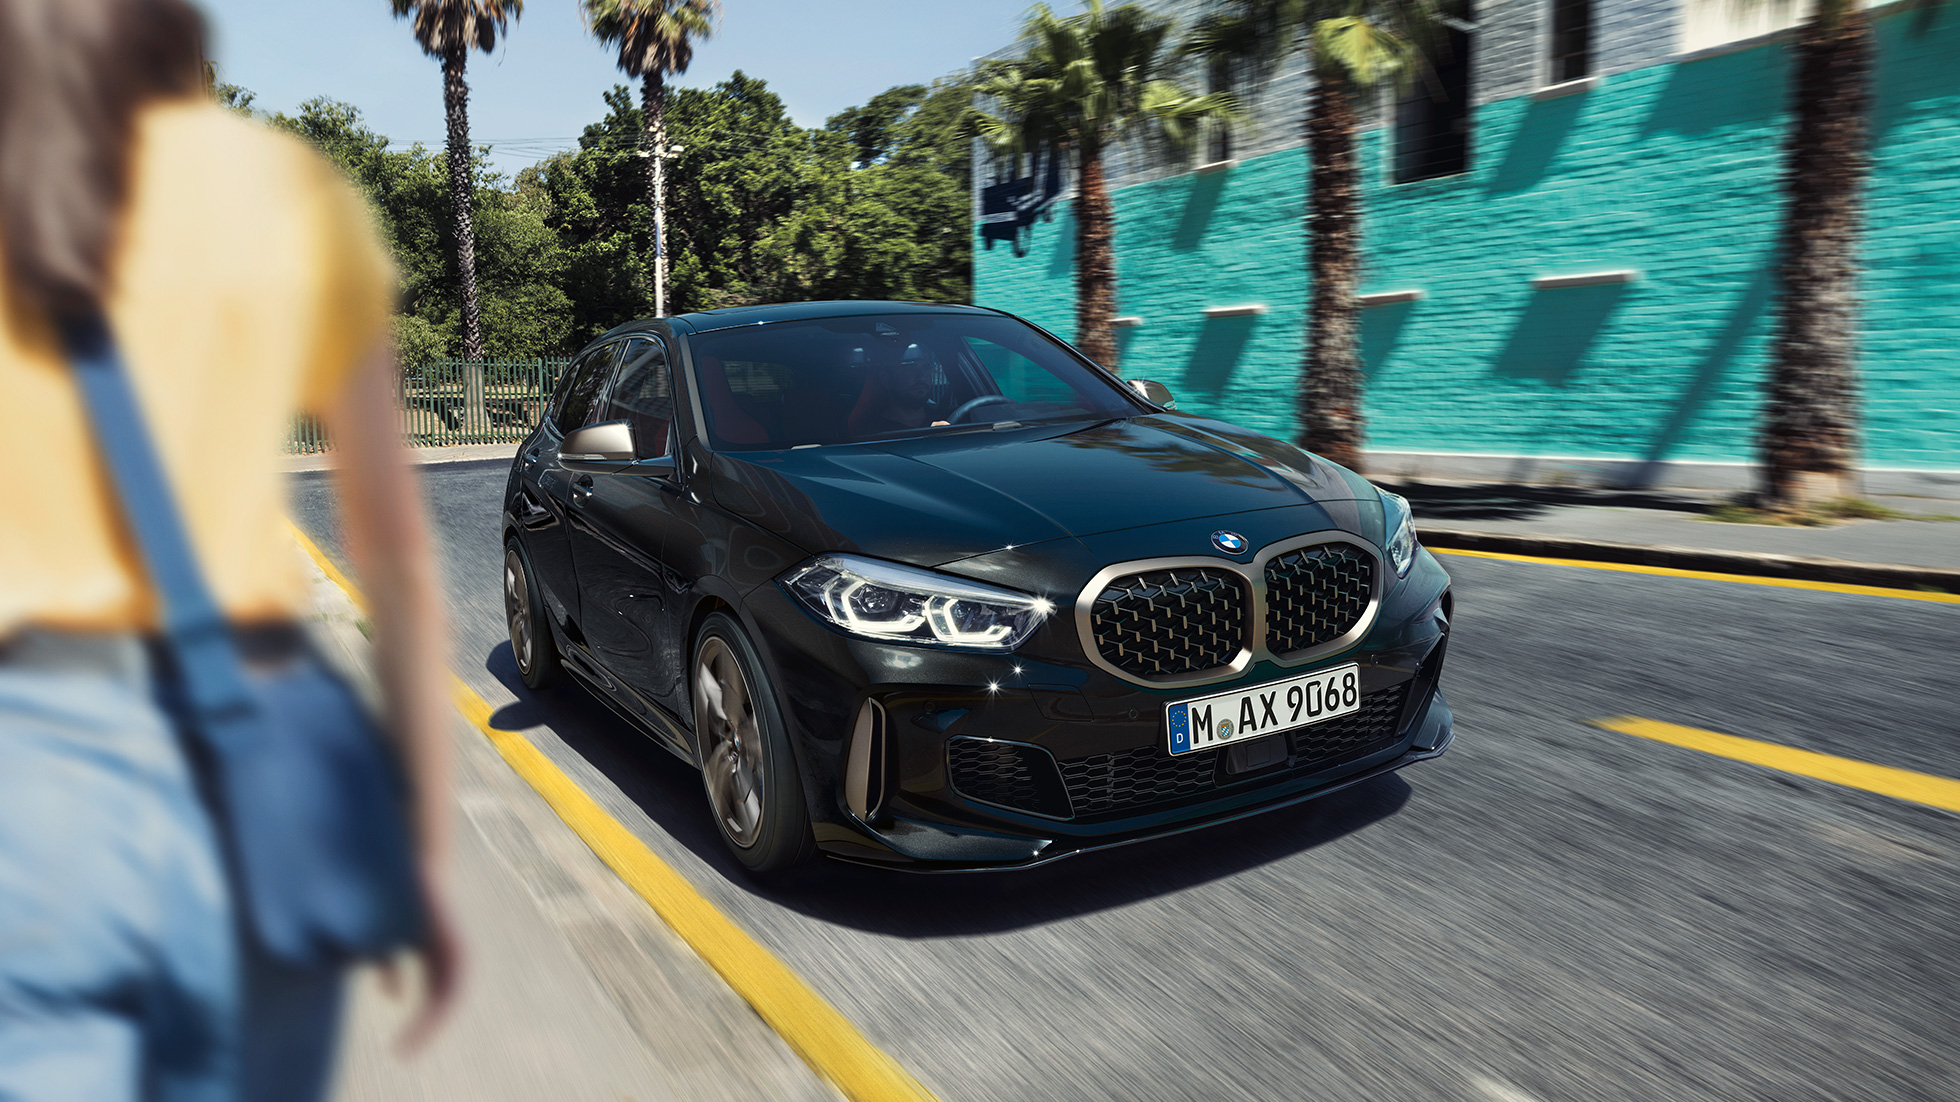 2018 - [BMW] Série 1 III [F40-F41] - Page 19 Bmw-1-series-m135i-inspire-mg-exterior-interior-desktop-01